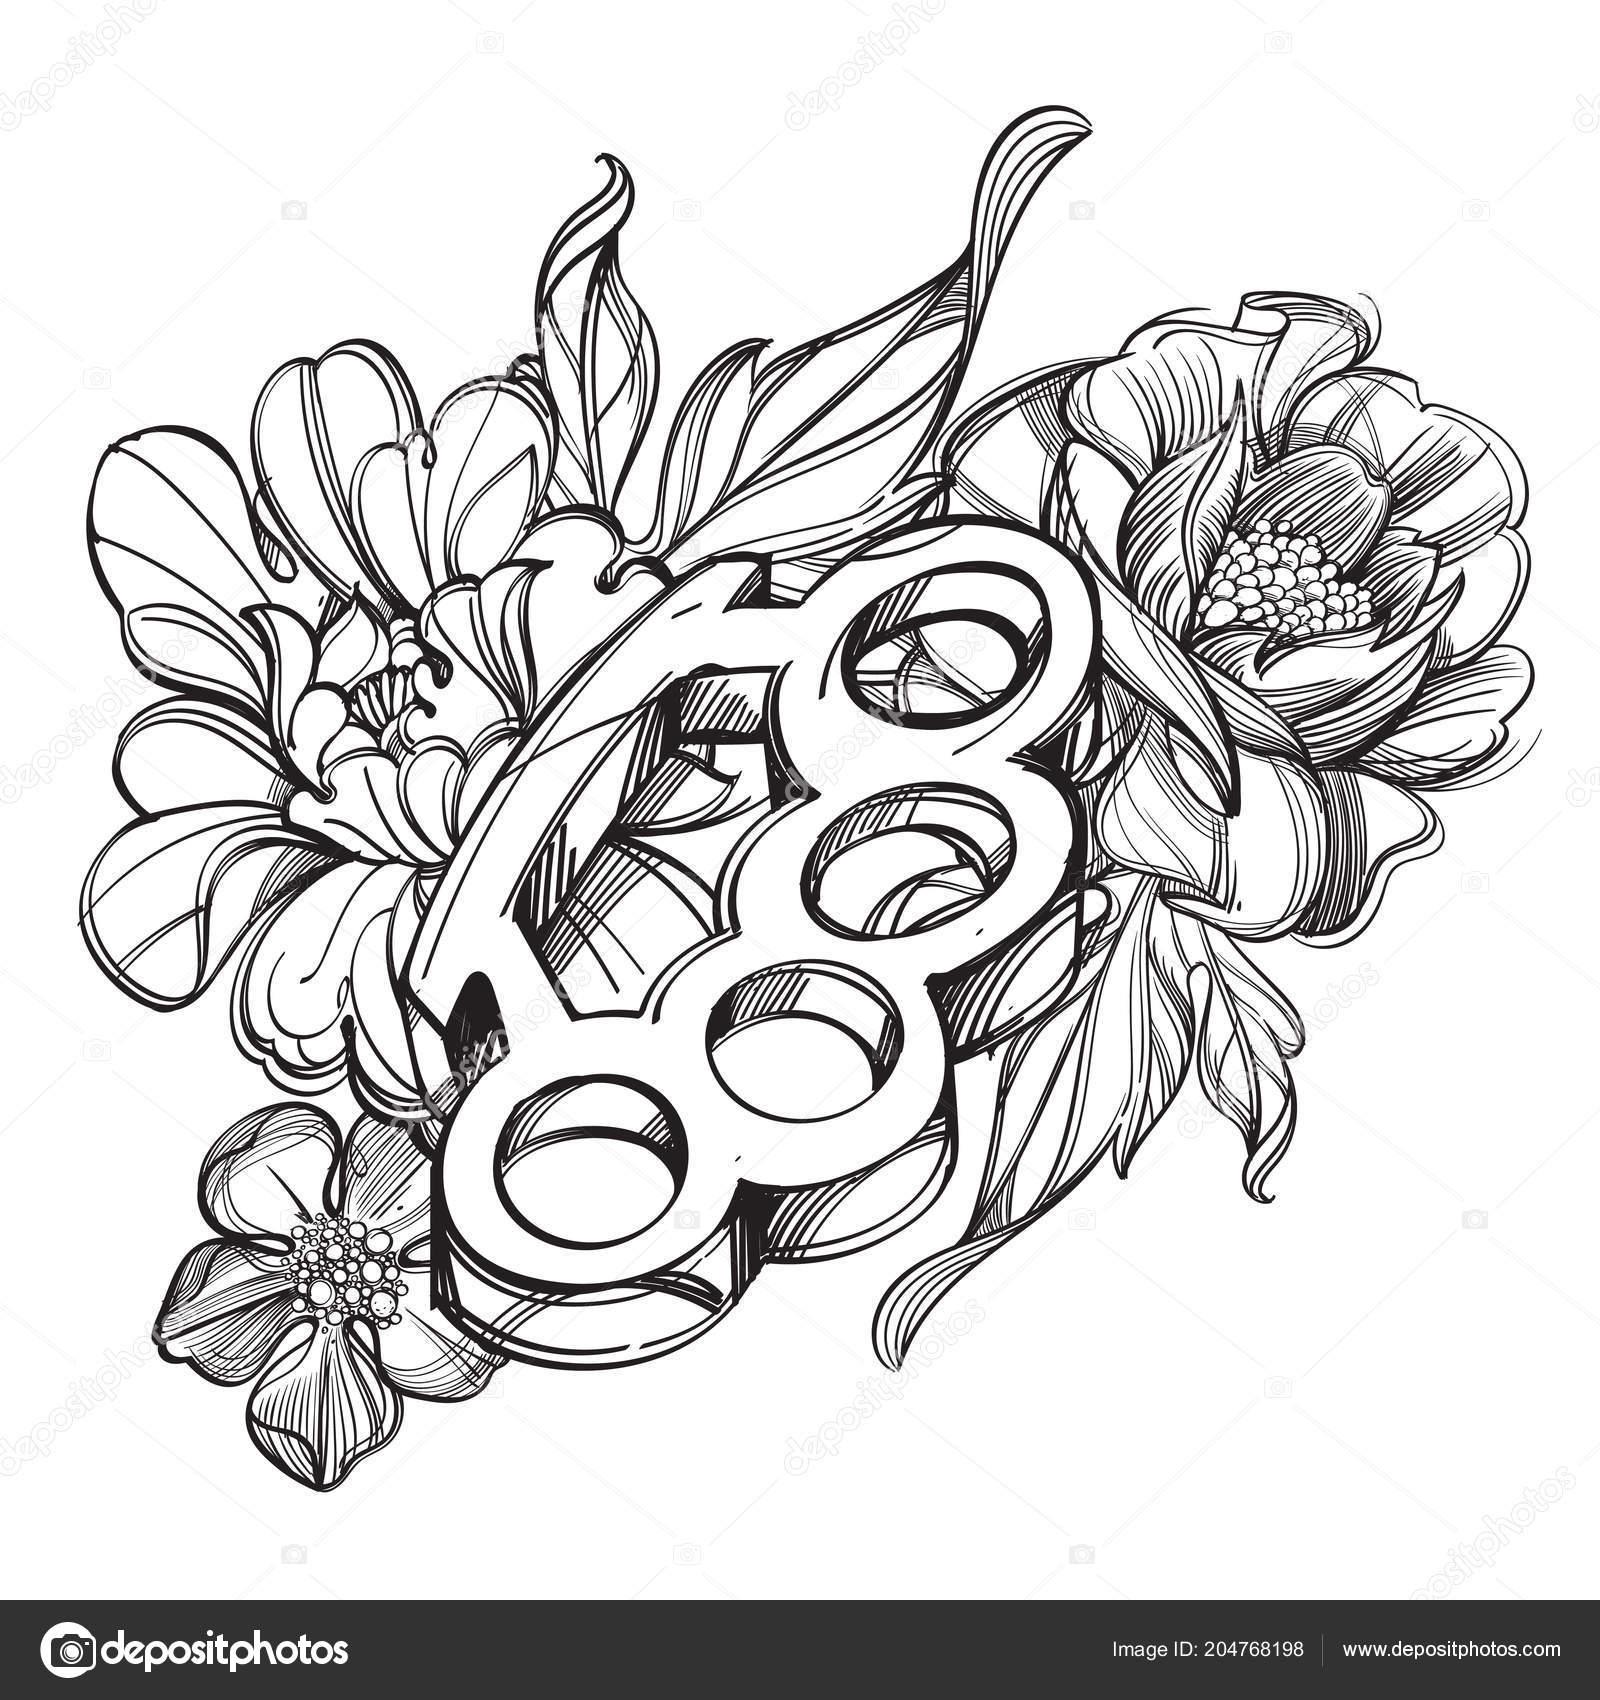 Rosa Dibujo Para Tatuaje Nudillos Latón Cinta Bandera Contorno